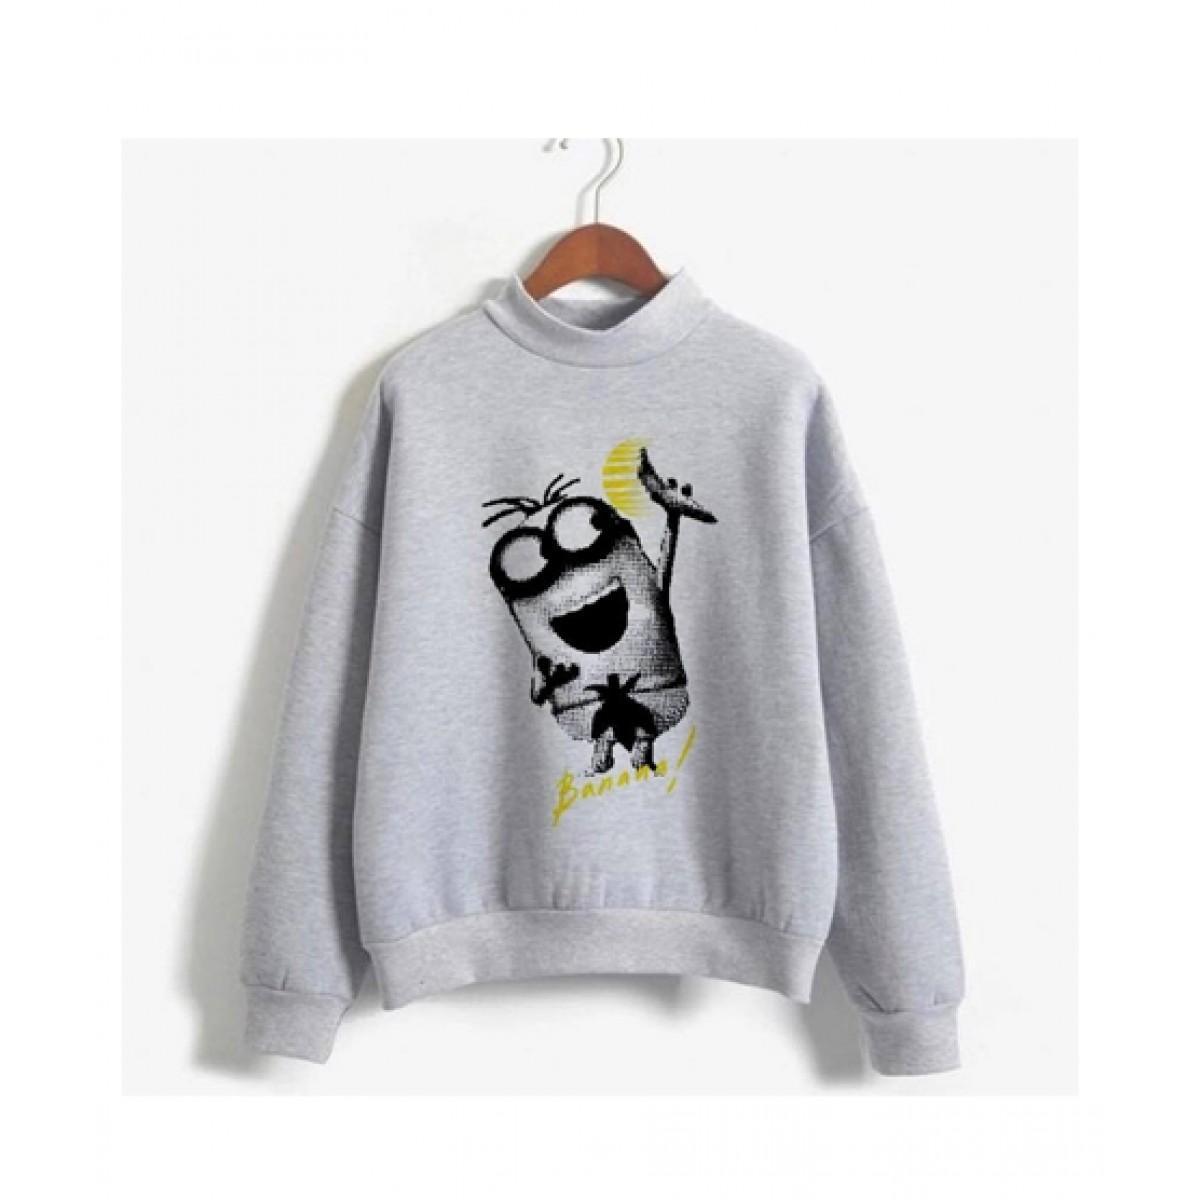 He & She Banana Printed Sweat Shirt For Unisex Grey (0019)